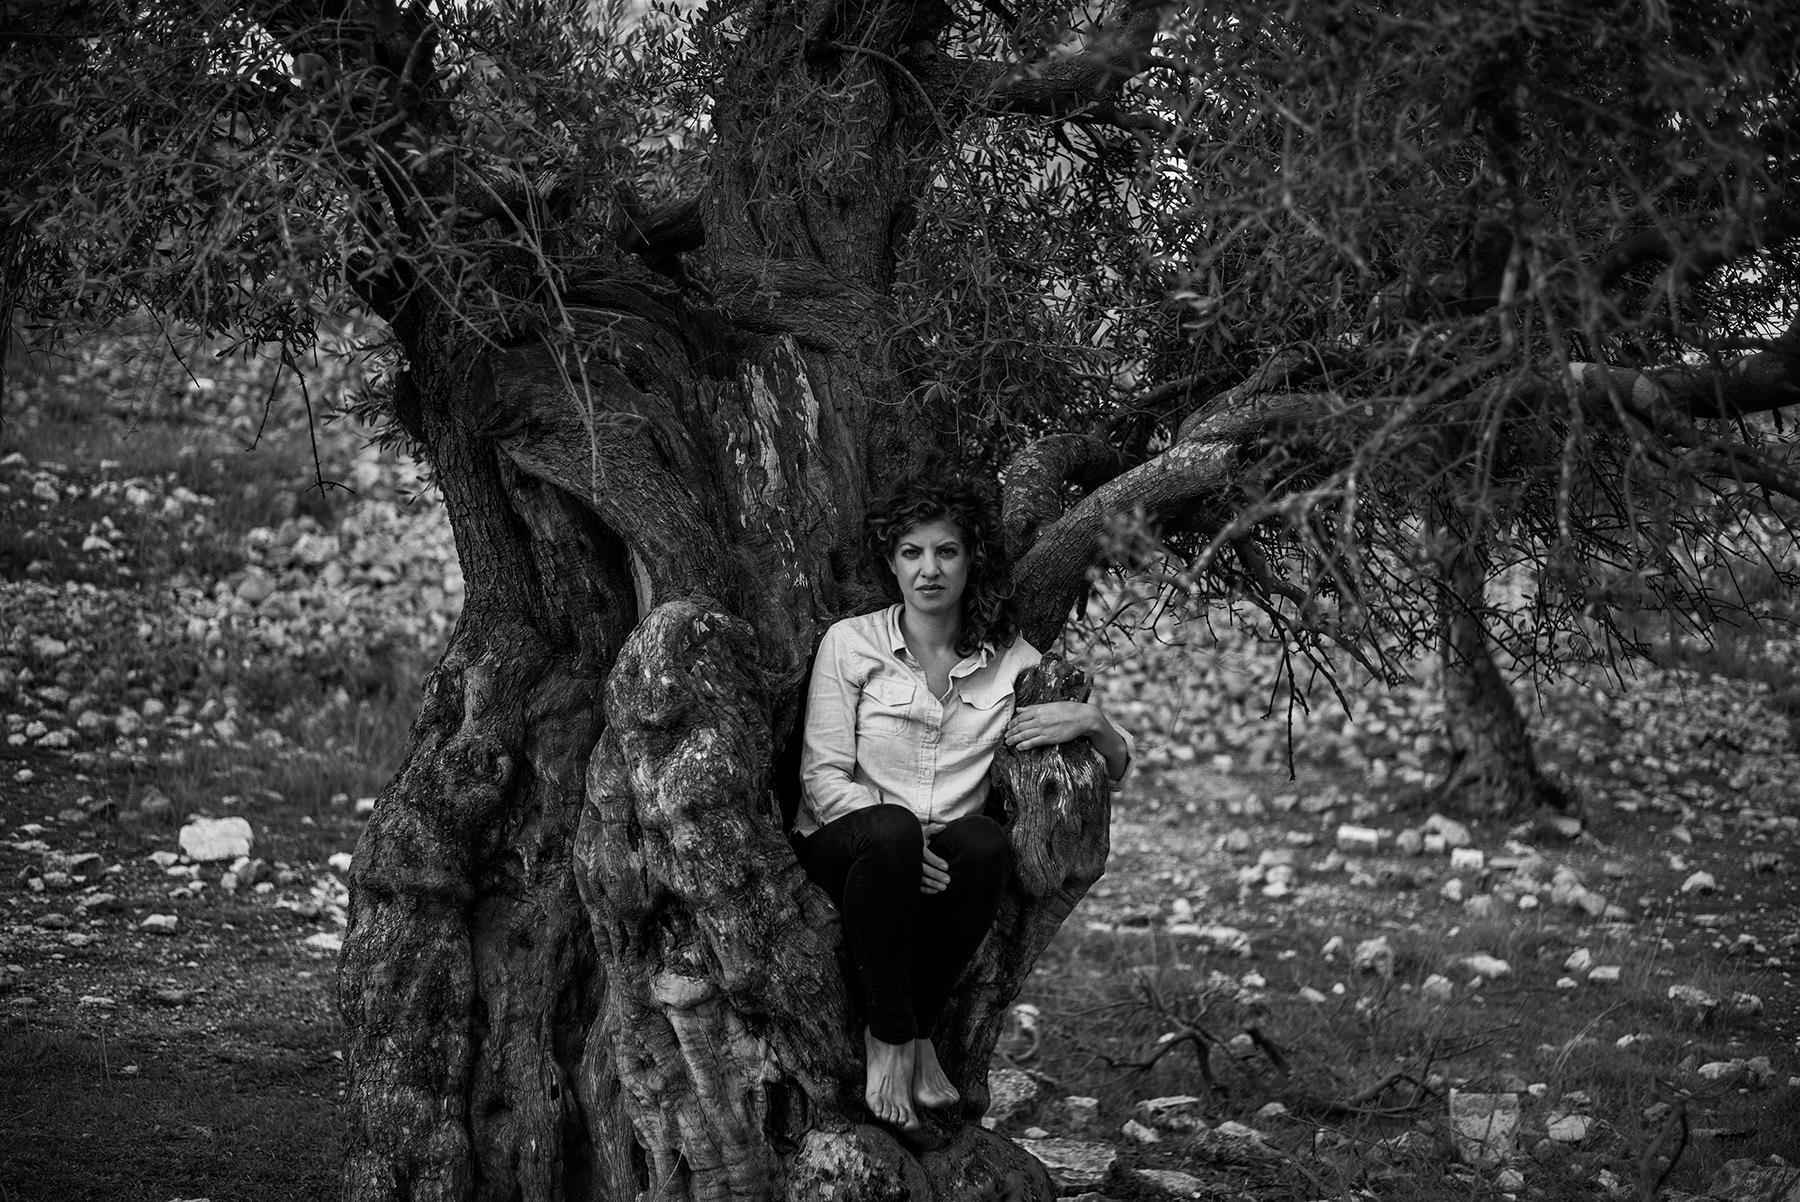 Photo by    Ilia Yefimovich   .